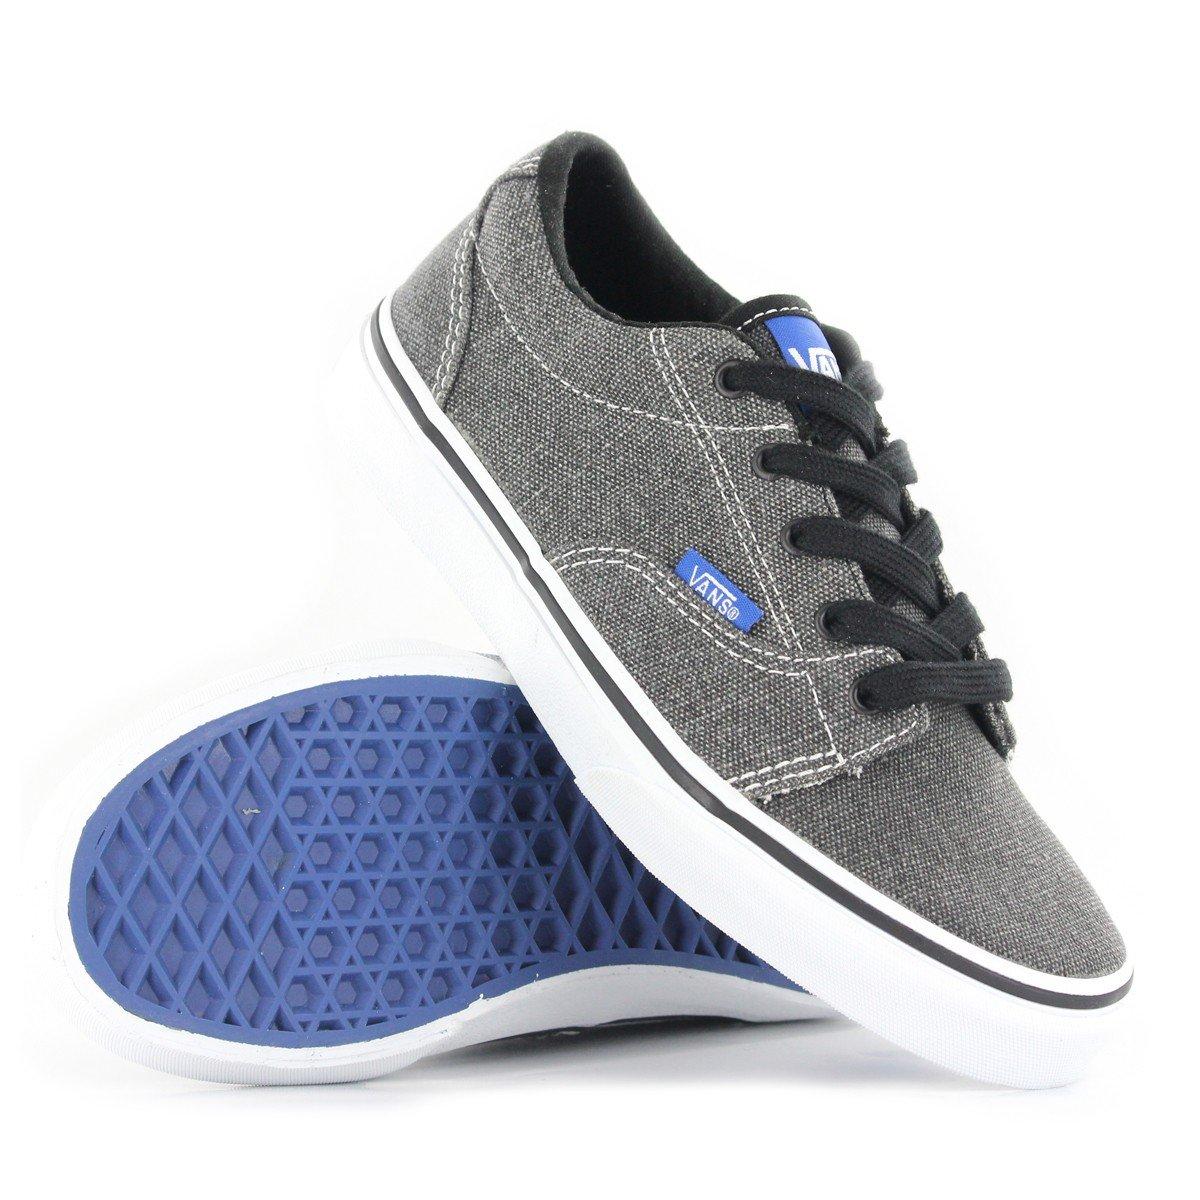 a63b310c5c Vans Classic Kress Grey Blue Kids Trainers Size 1.5 UK  Amazon.co.uk  Shoes    Bags